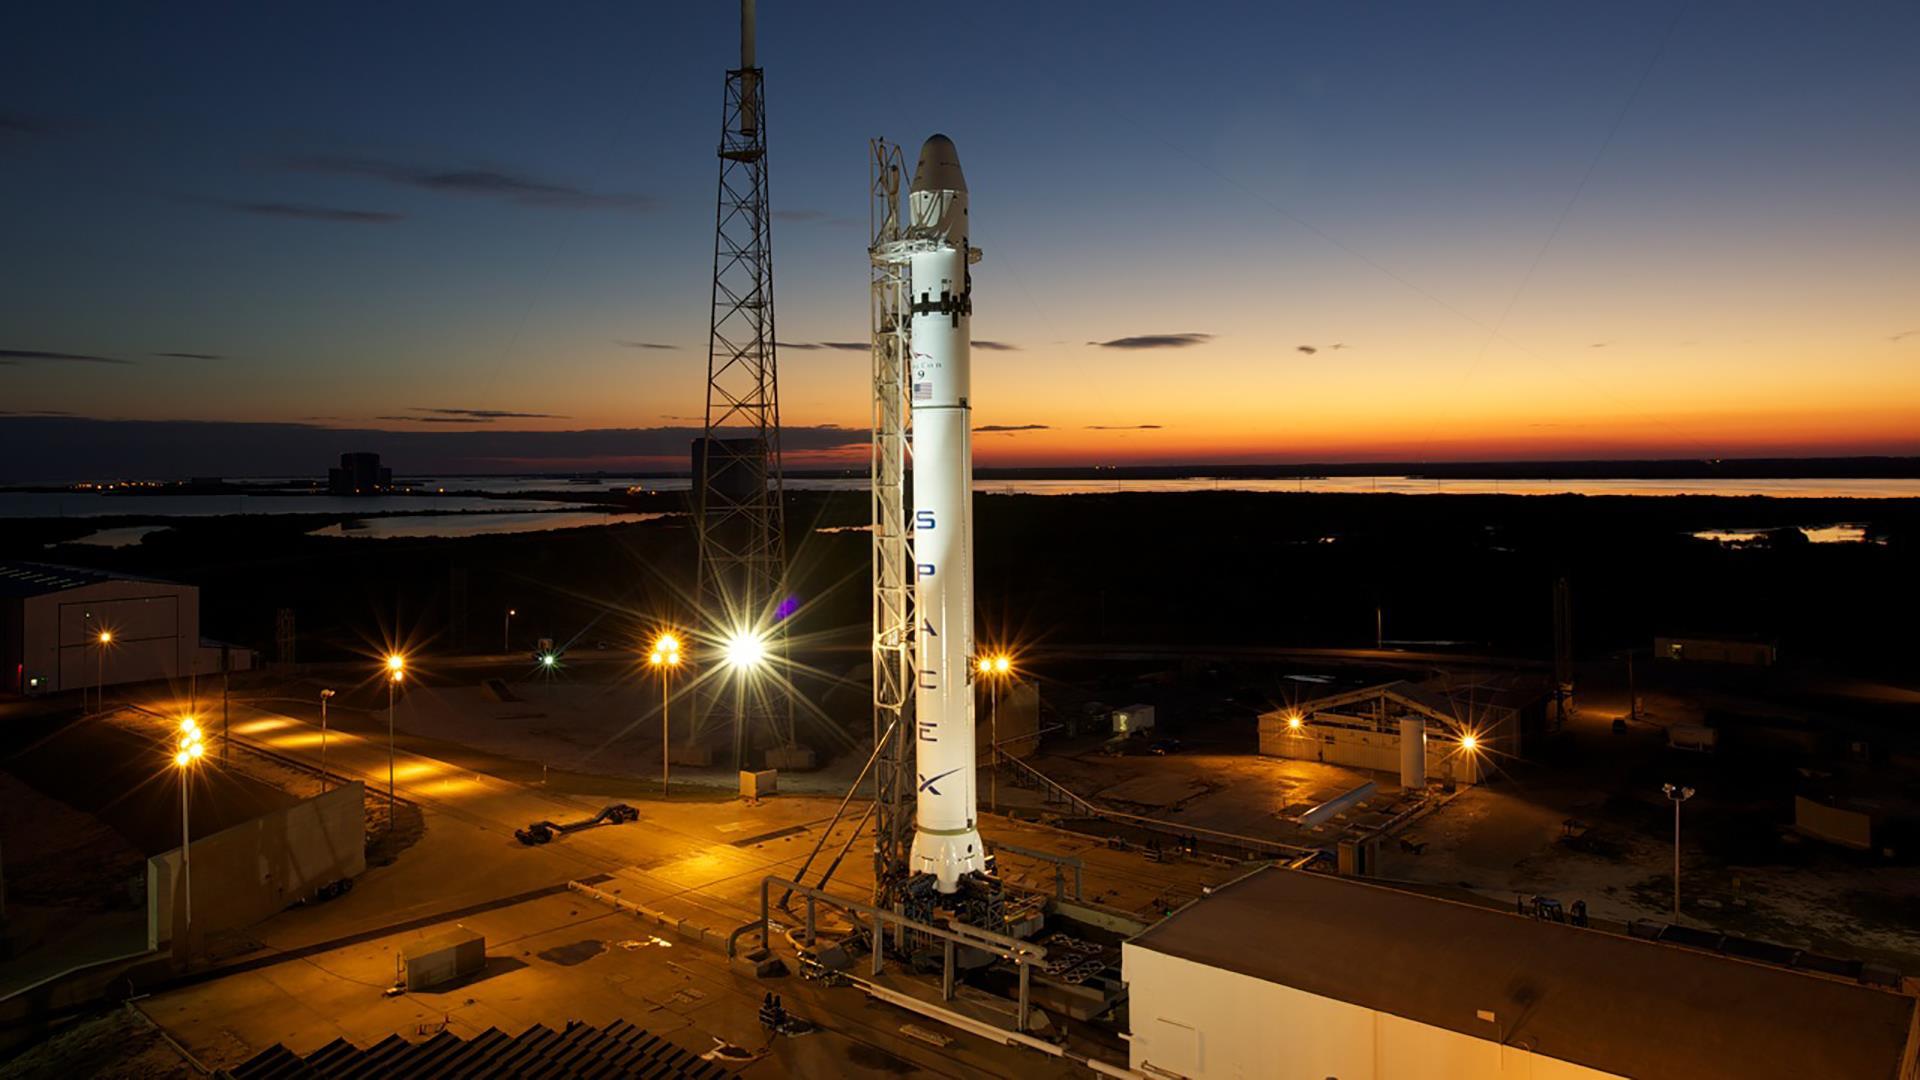 spacex cape canaveral fl - photo #45